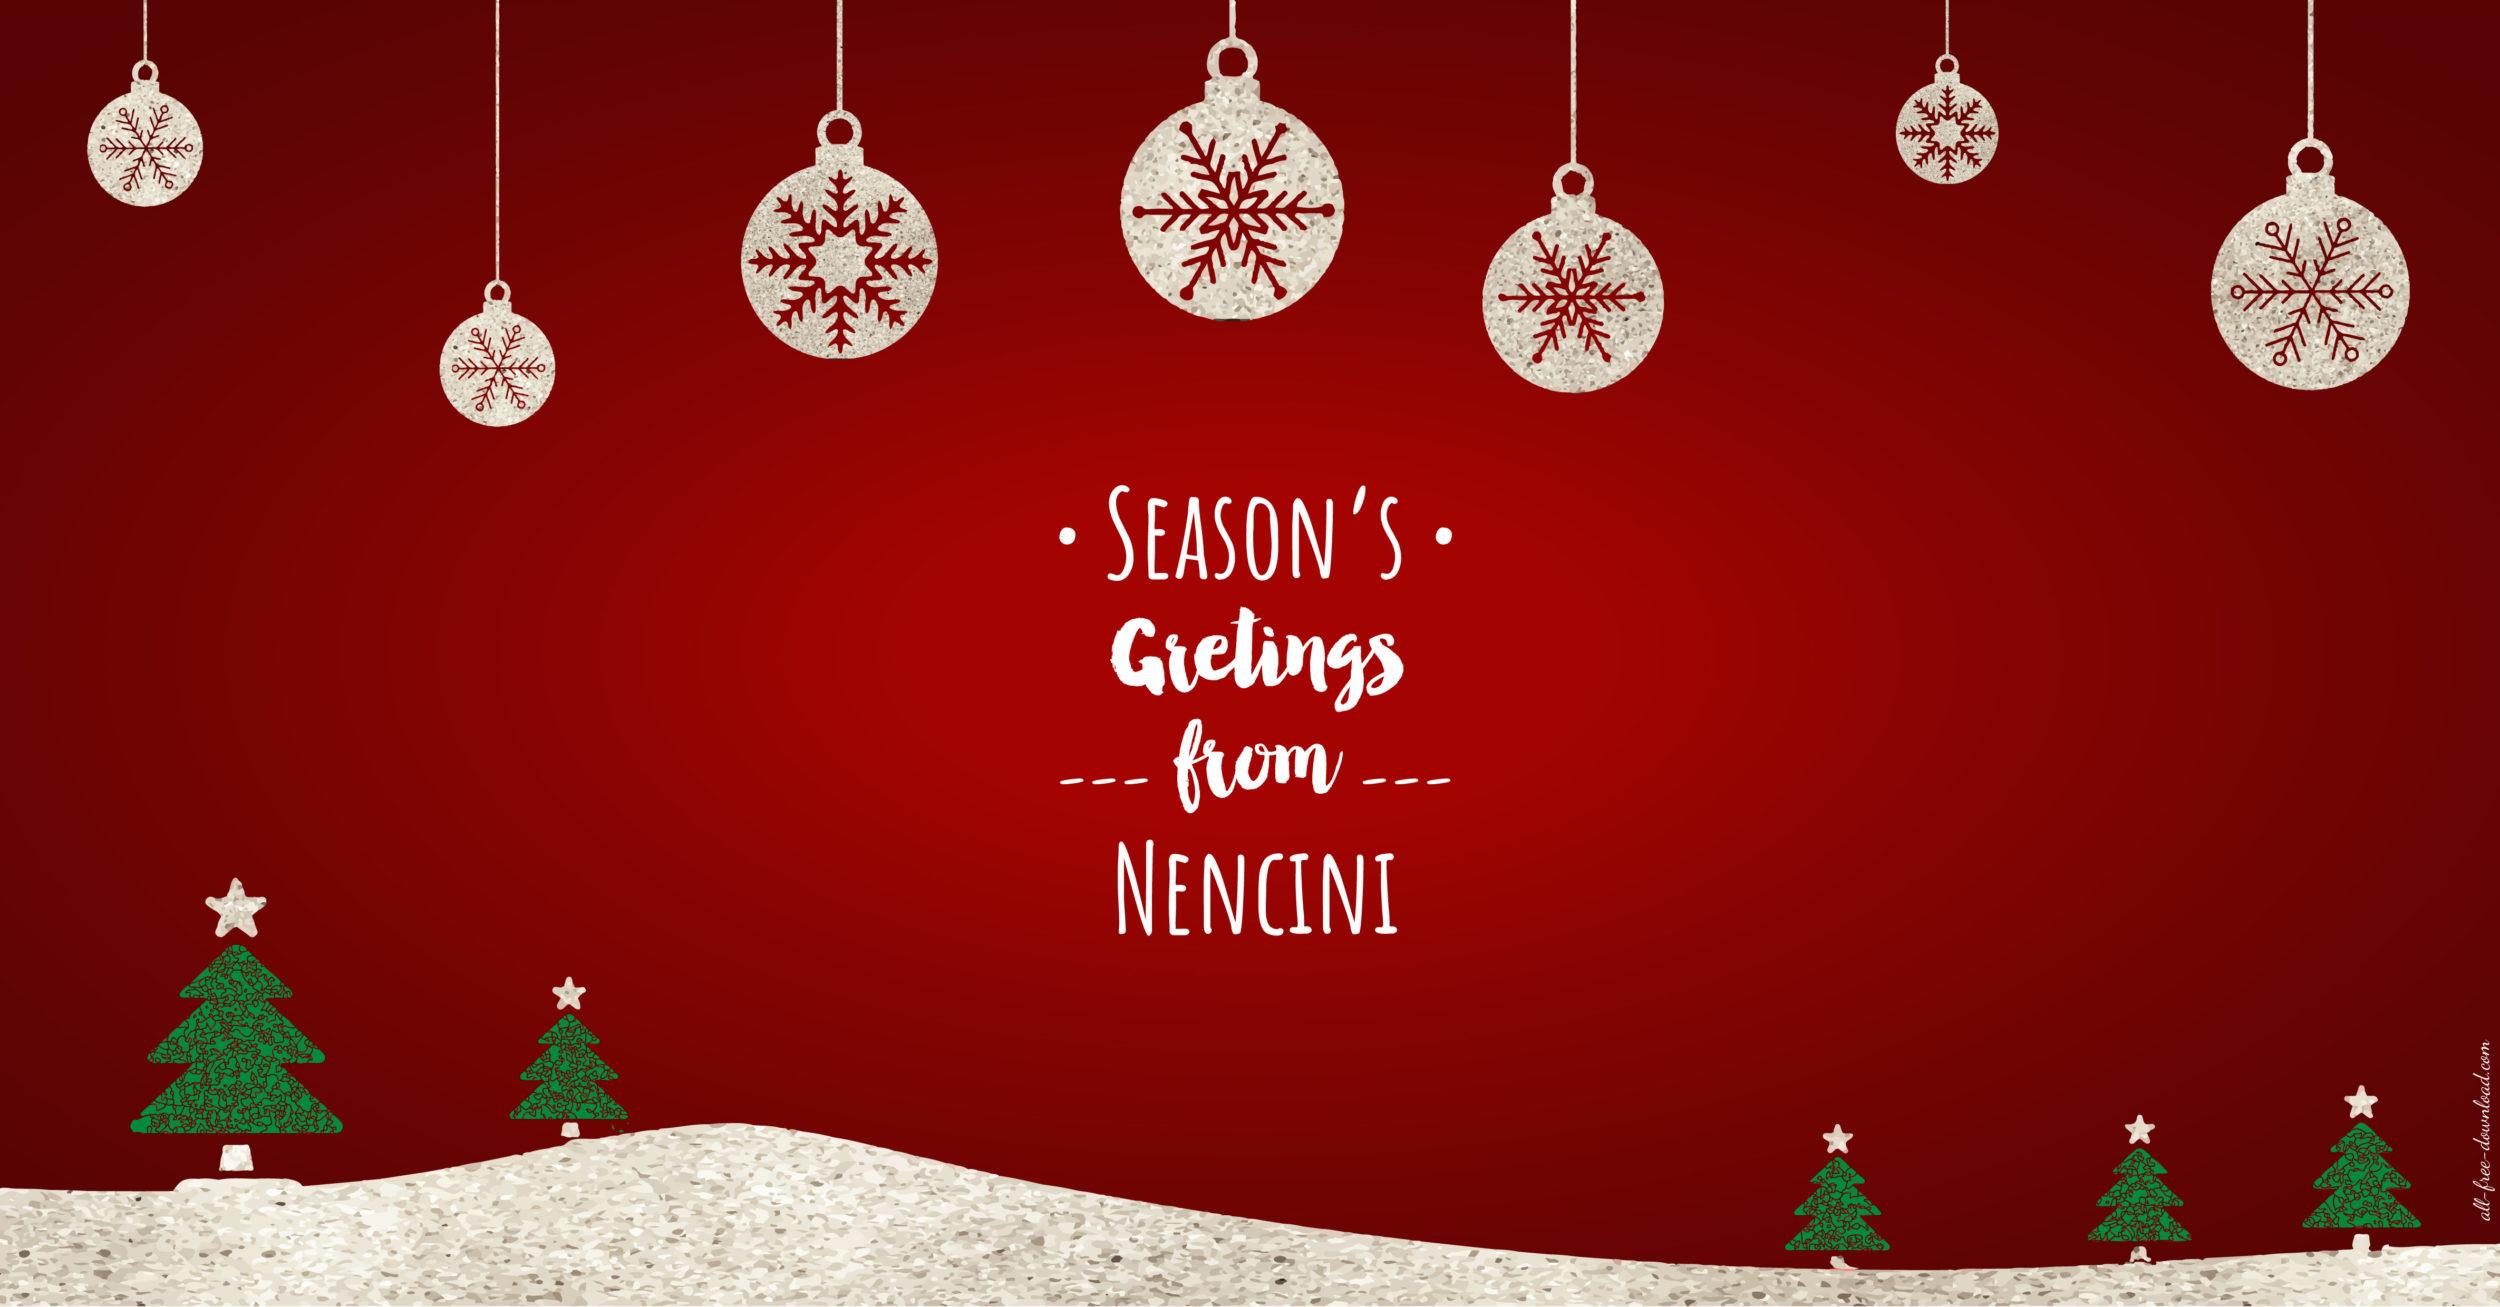 Seasons greetings from nencini nencini srl seasons greetings from nencini m4hsunfo Gallery